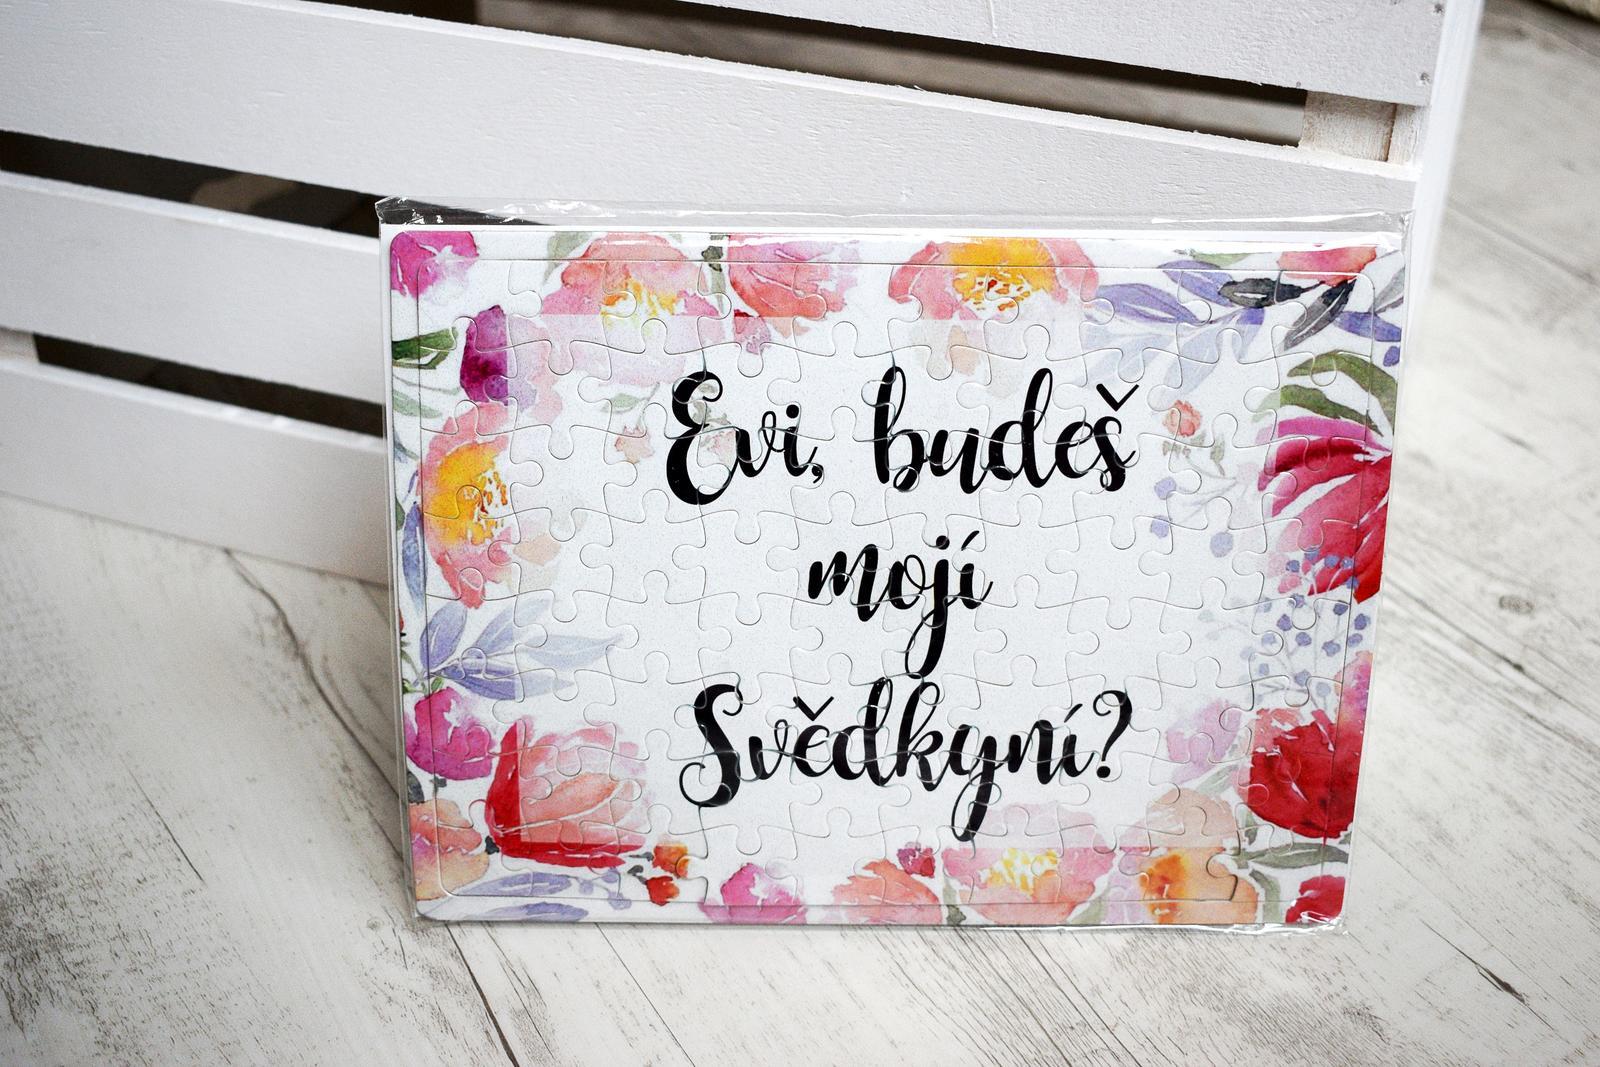 erika_rekniano - puzzle pro svědkyni